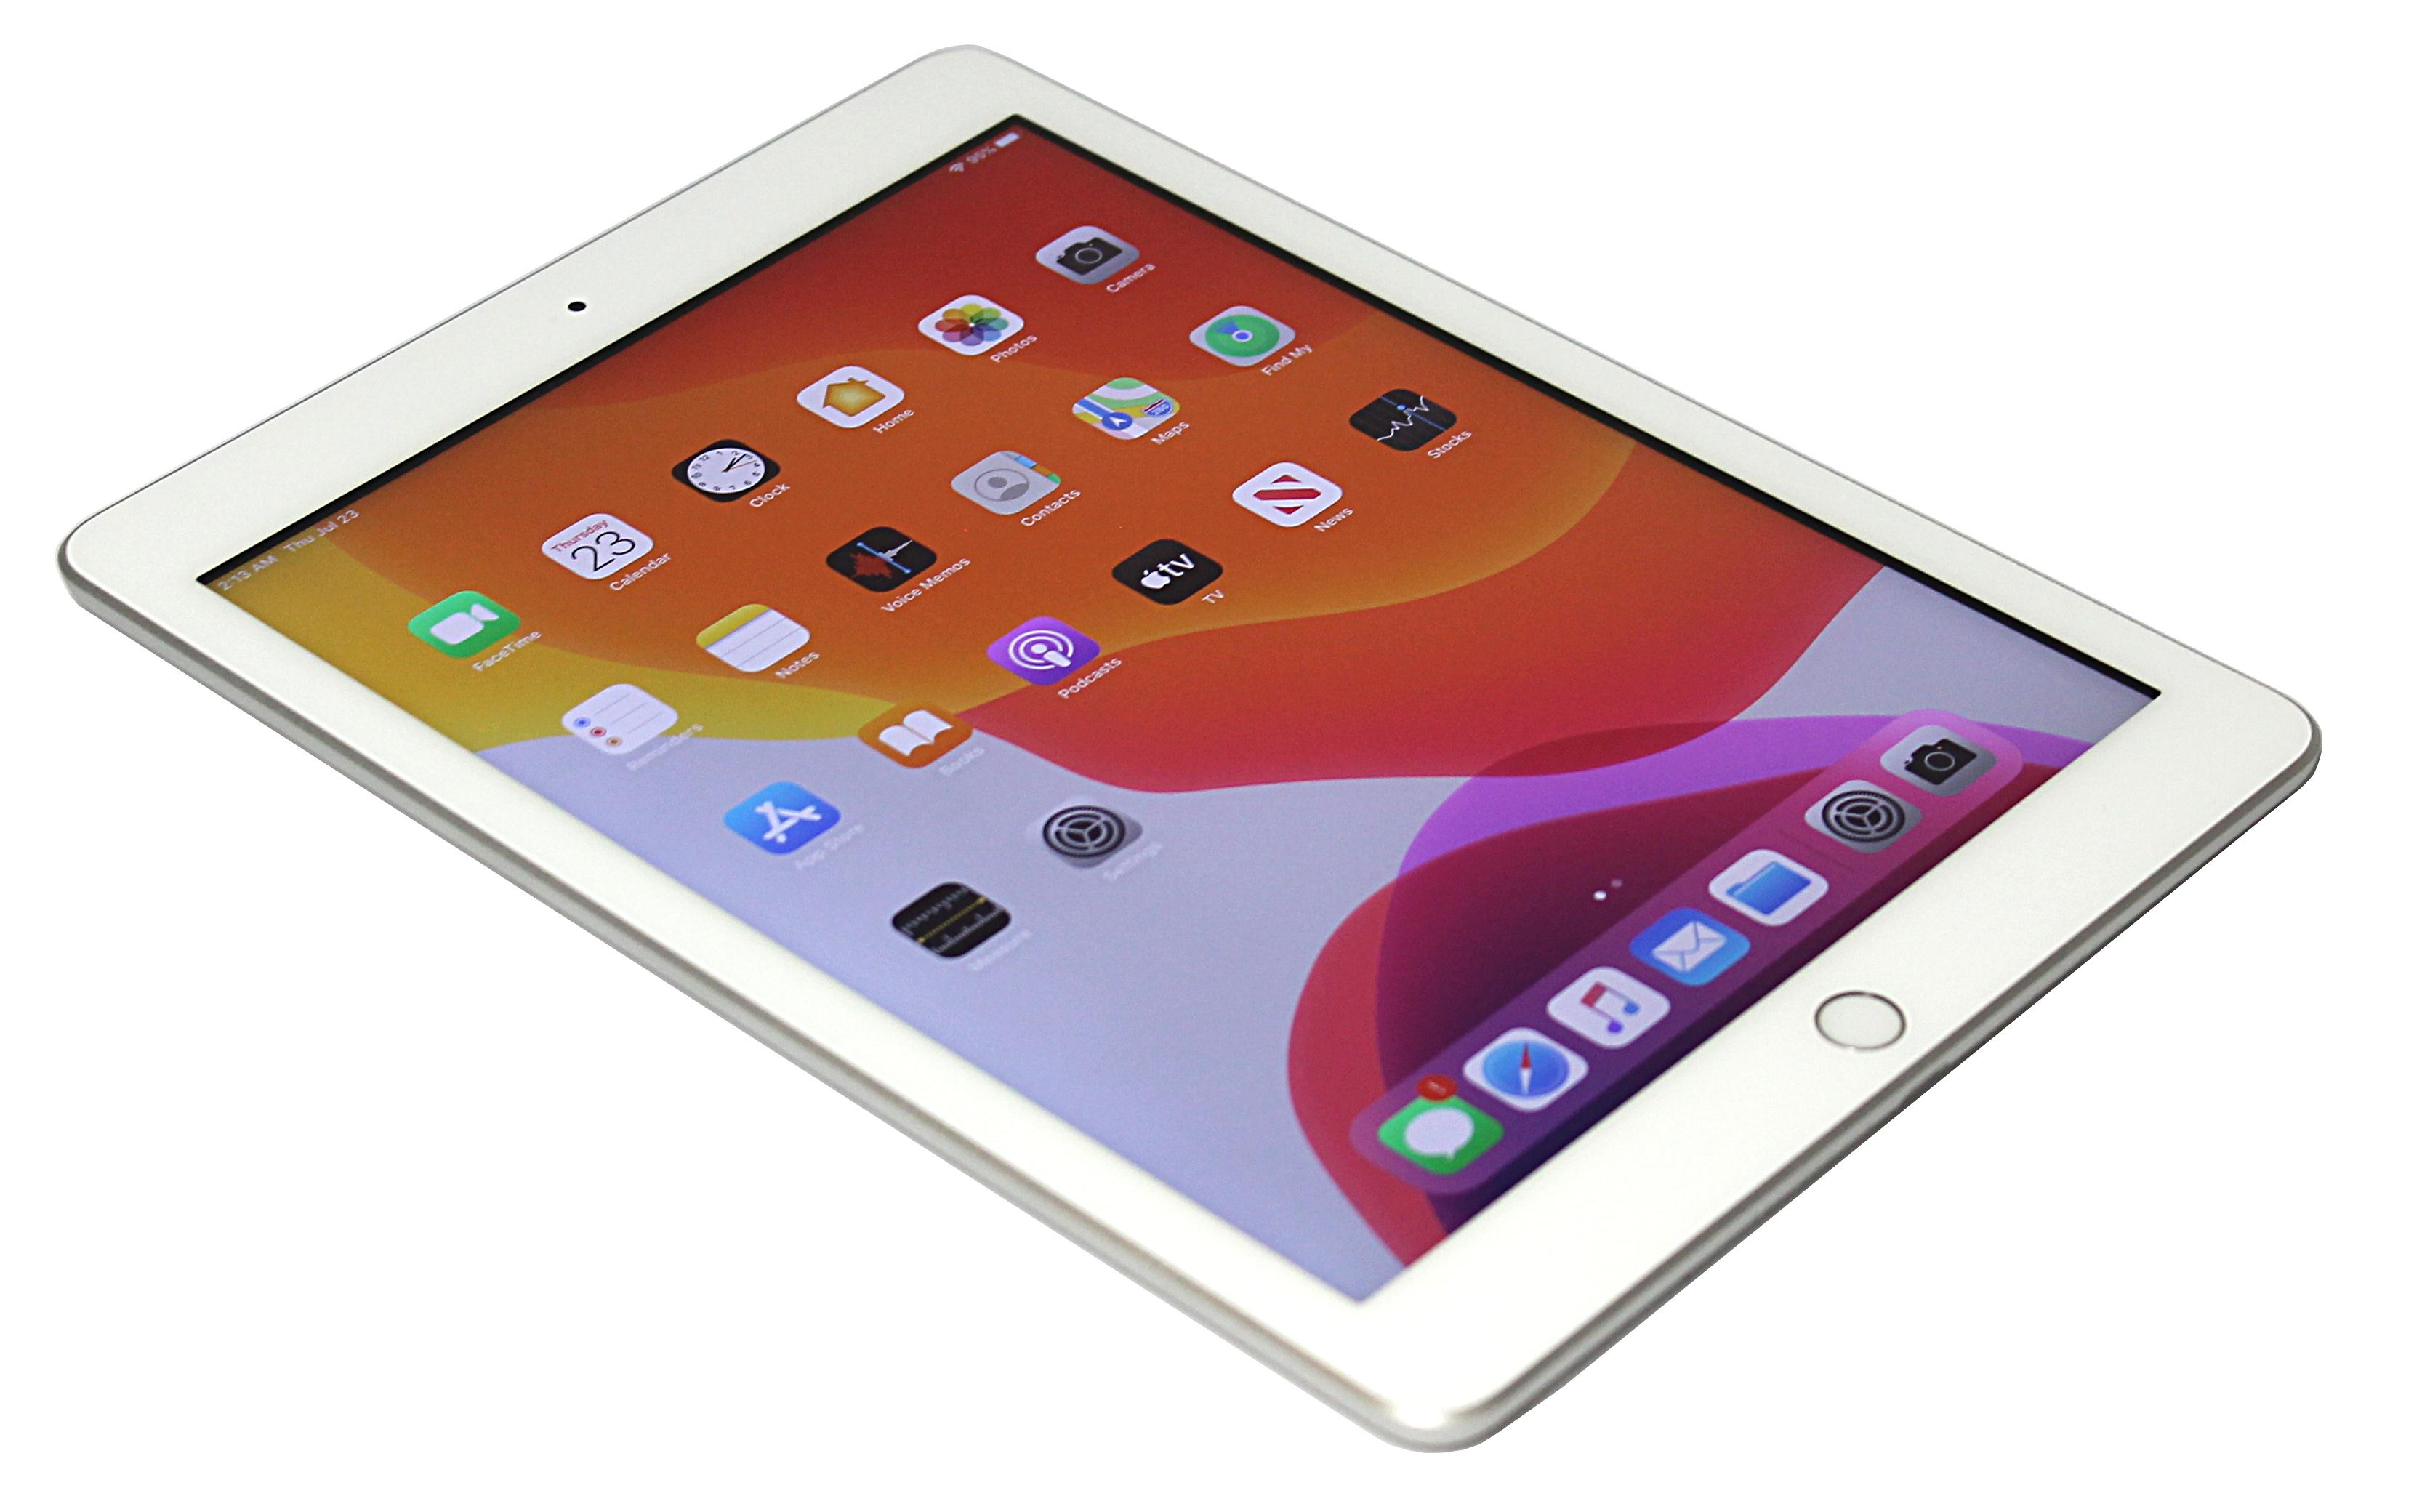 Apple iPad 7th Gen. A2197 - 32GB WiFi Silver No Touch ID Refurbished